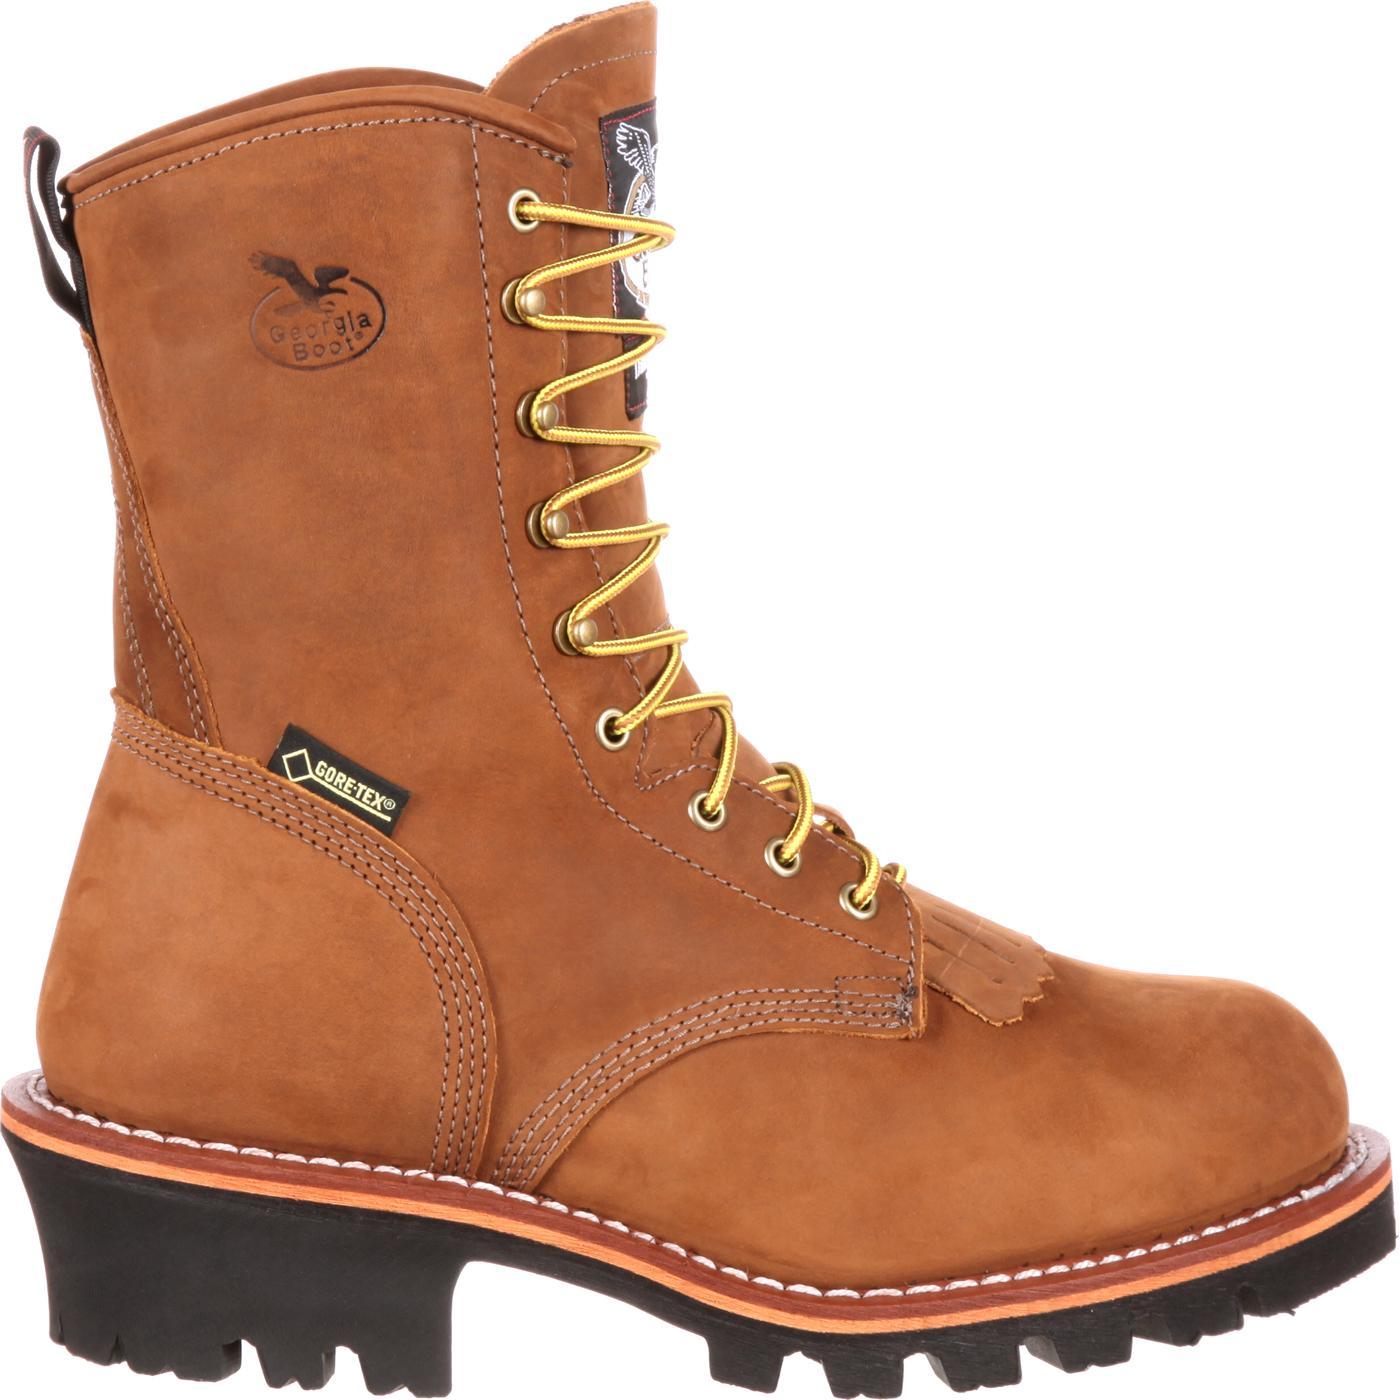 Georgia Logger Insulated Gore Tex 174 Steel Toe Work Boots